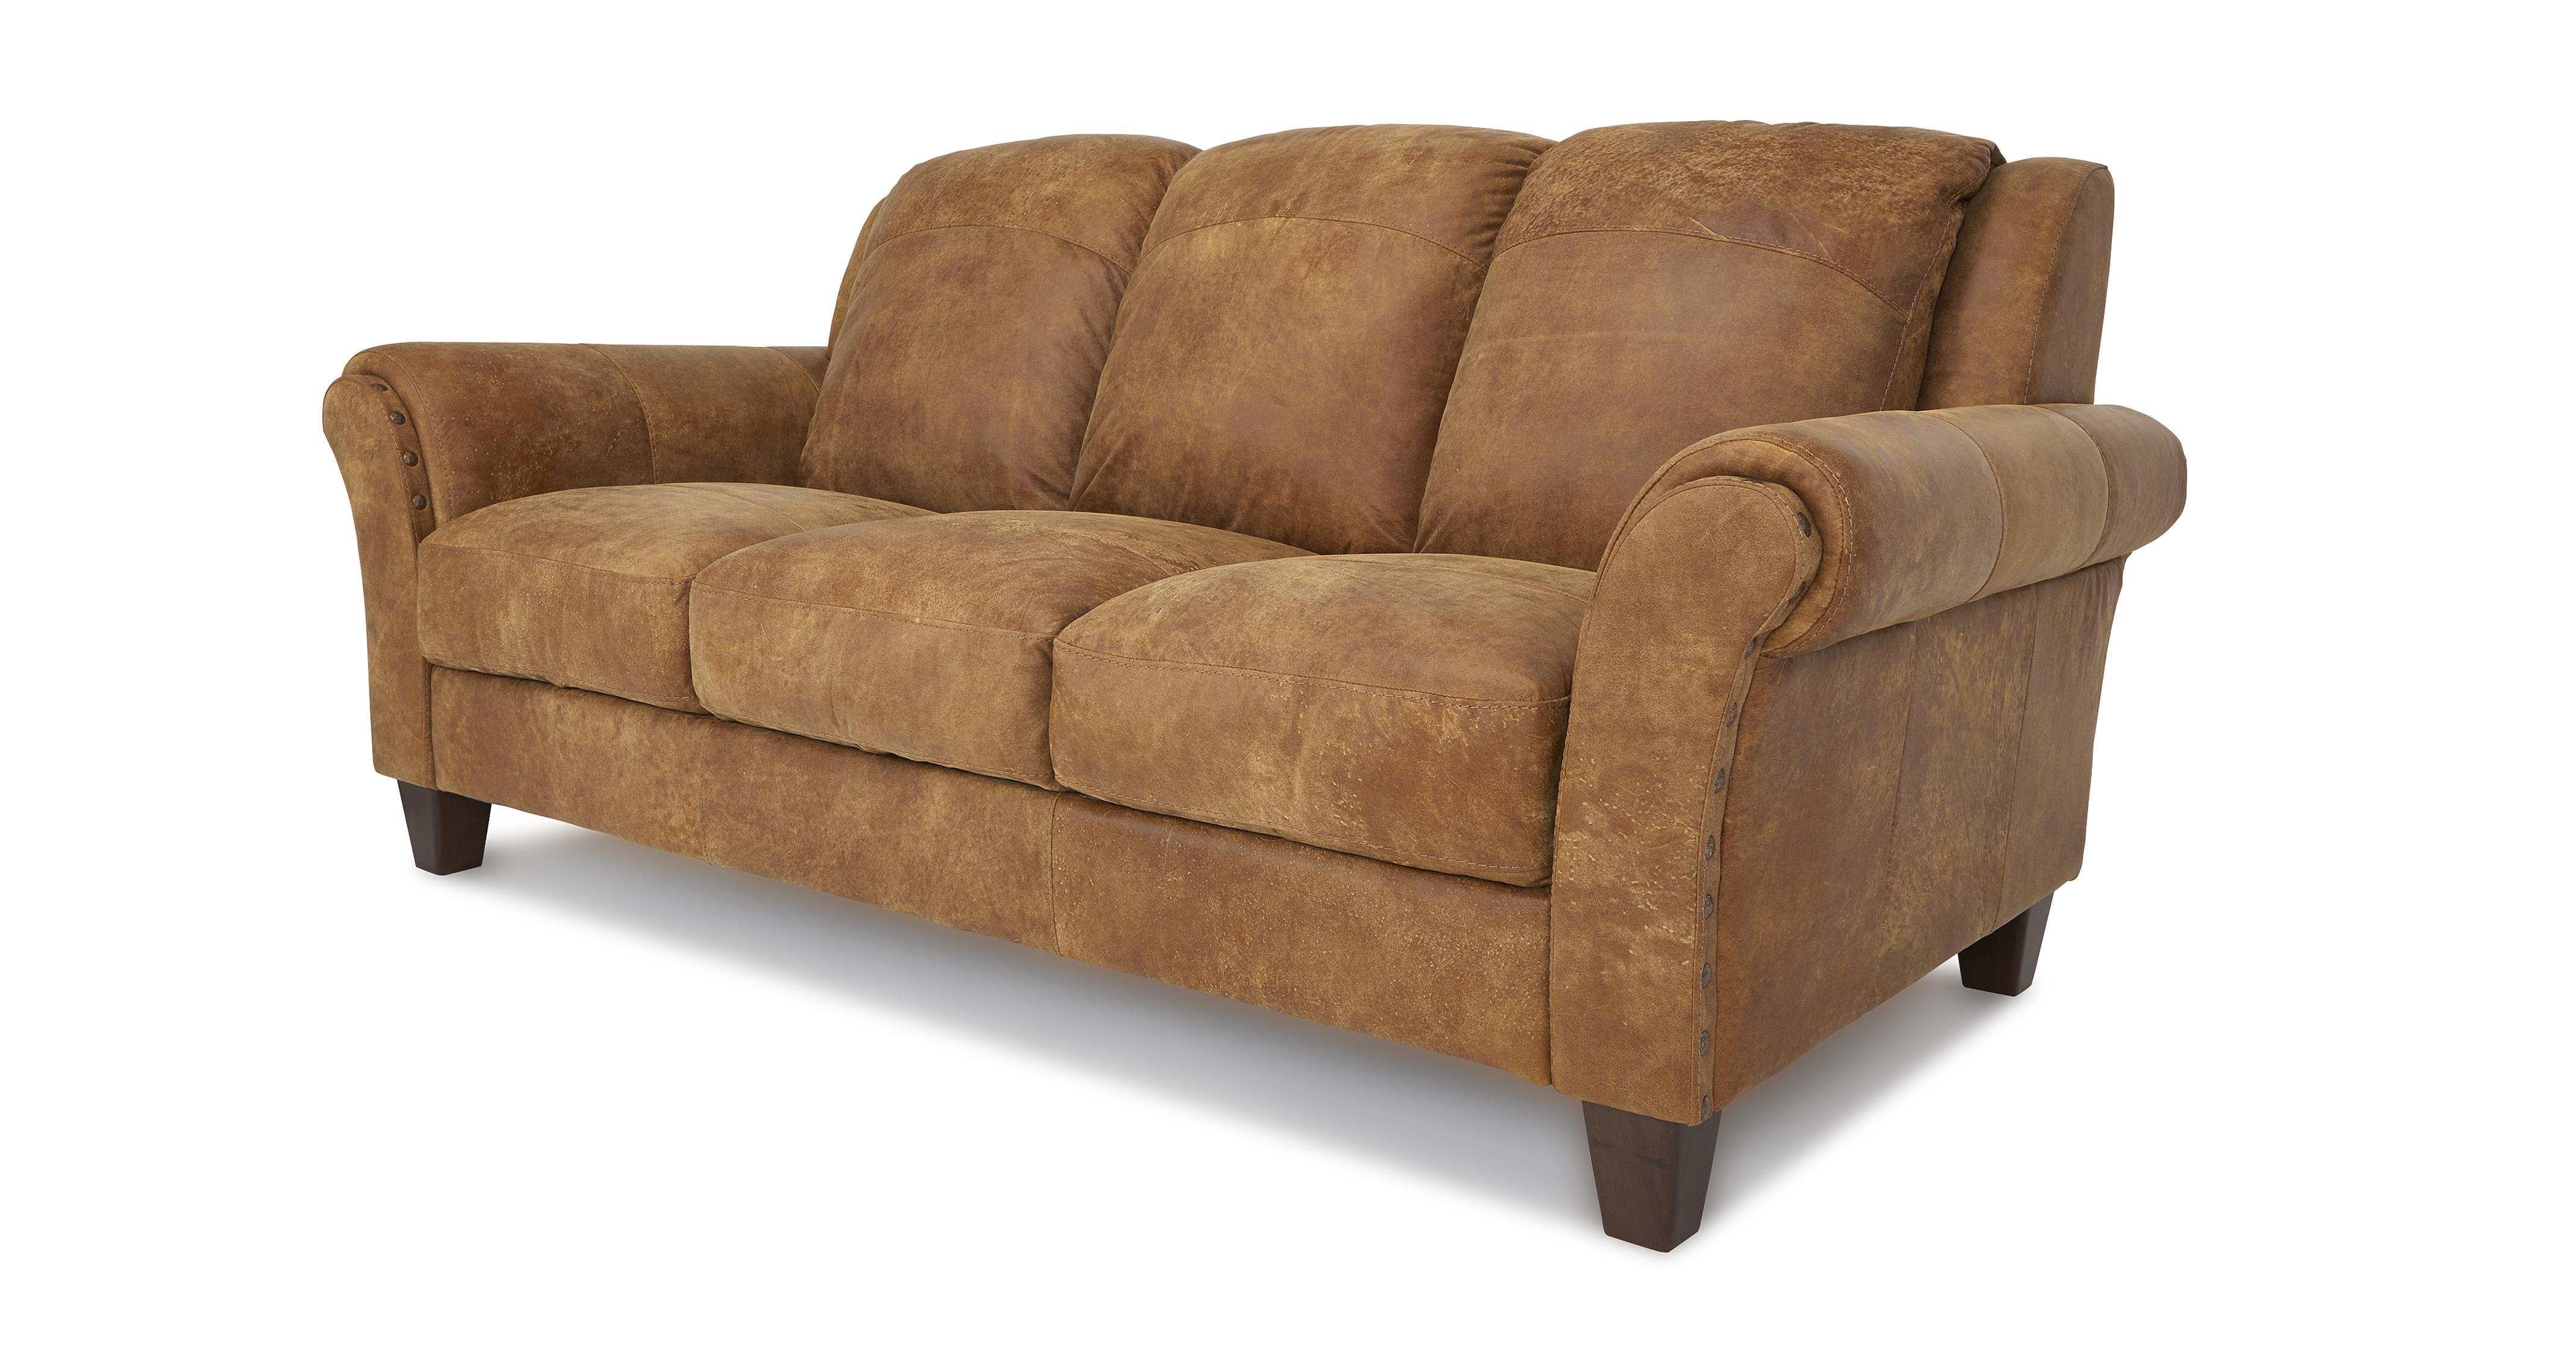 DFS Peyton Ranch Leather Sofa Set Inc 3 Seater 2 Seater & Storage